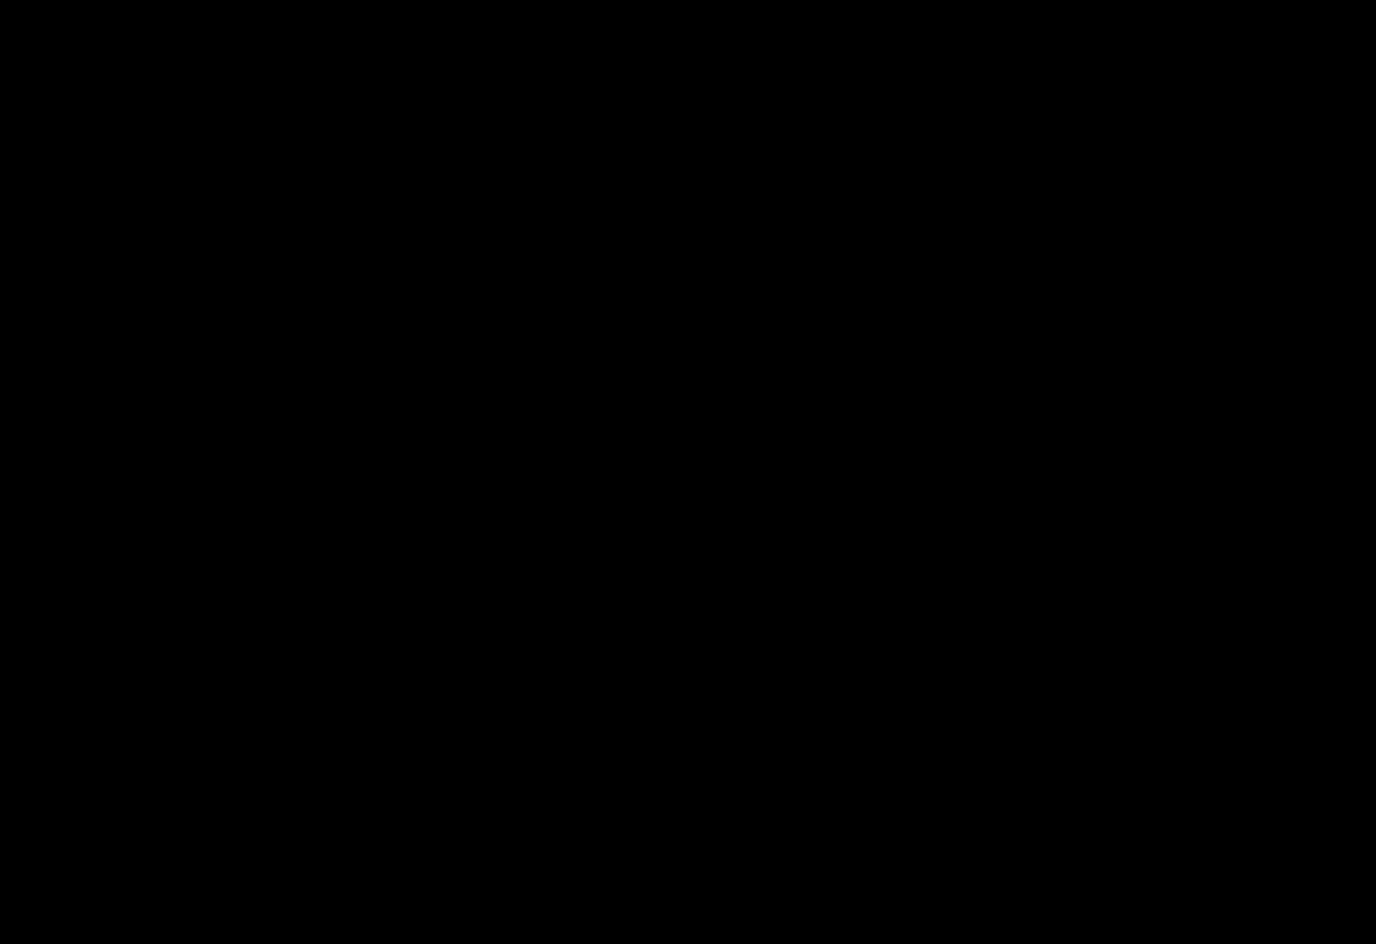 Amino-dPEG®₄-(m-dPEG®₂₄)₃